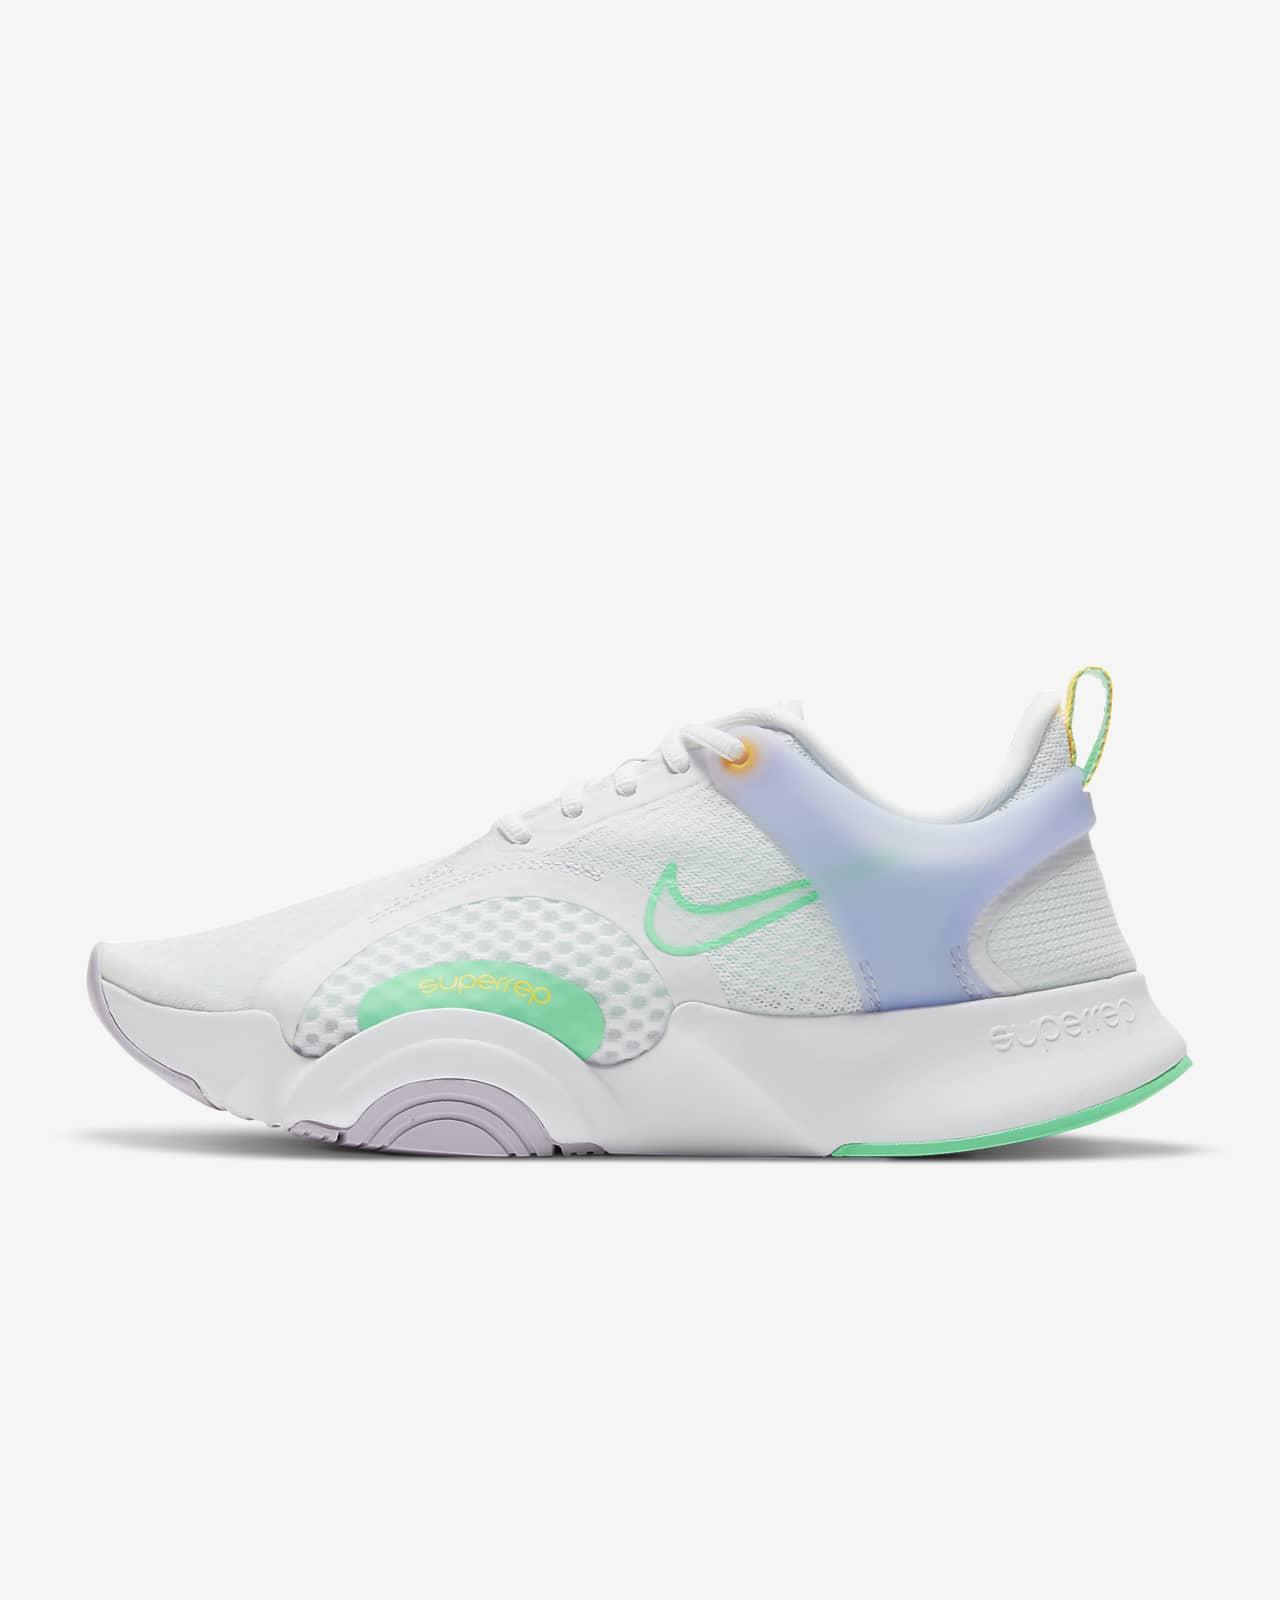 Damskie buty treningowe Nike SuperRep Go 2